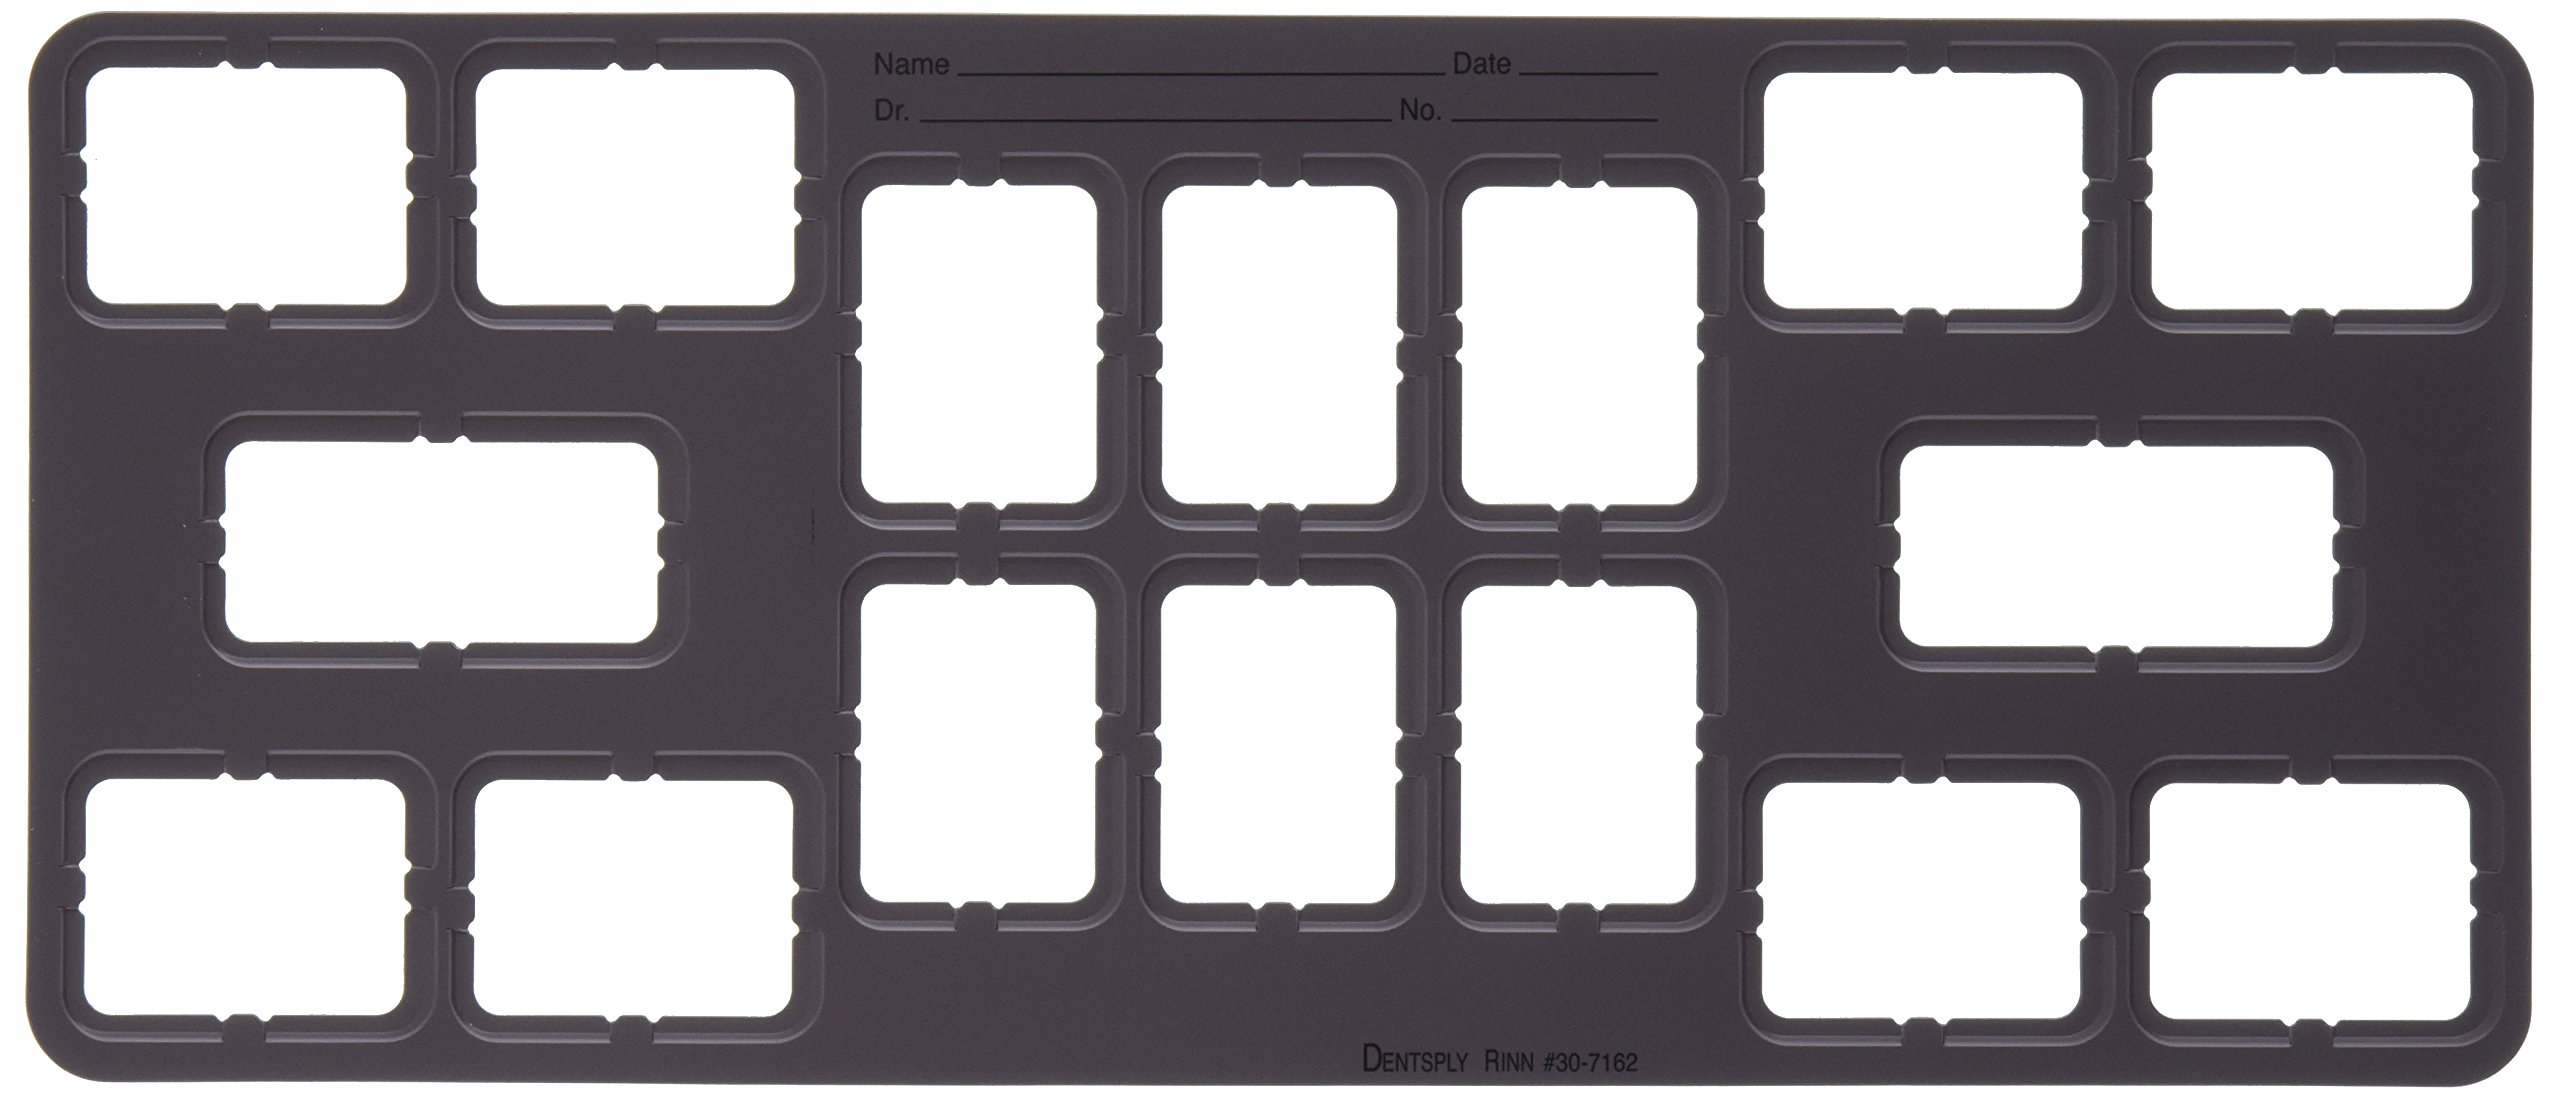 Dentsply 307162 EZ-Tab Plastic Series 30 Open Window, FMX #2, 8H, 6V, #3, 2BW, 124 mm Width, 289 mm Length, Grey (Pack of 100)